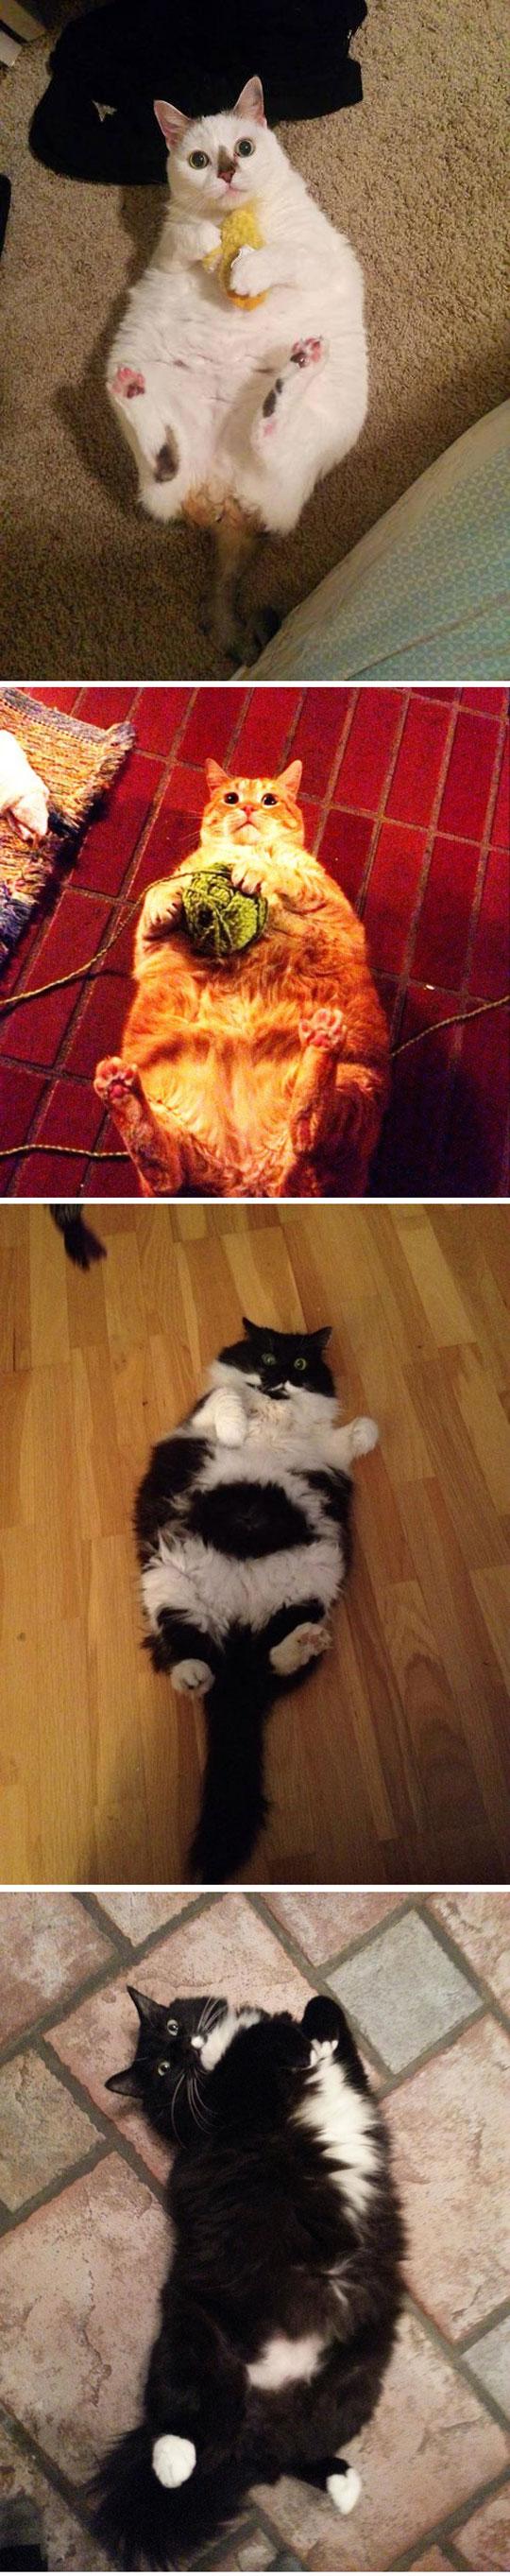 cute-cat-fat-laying-around